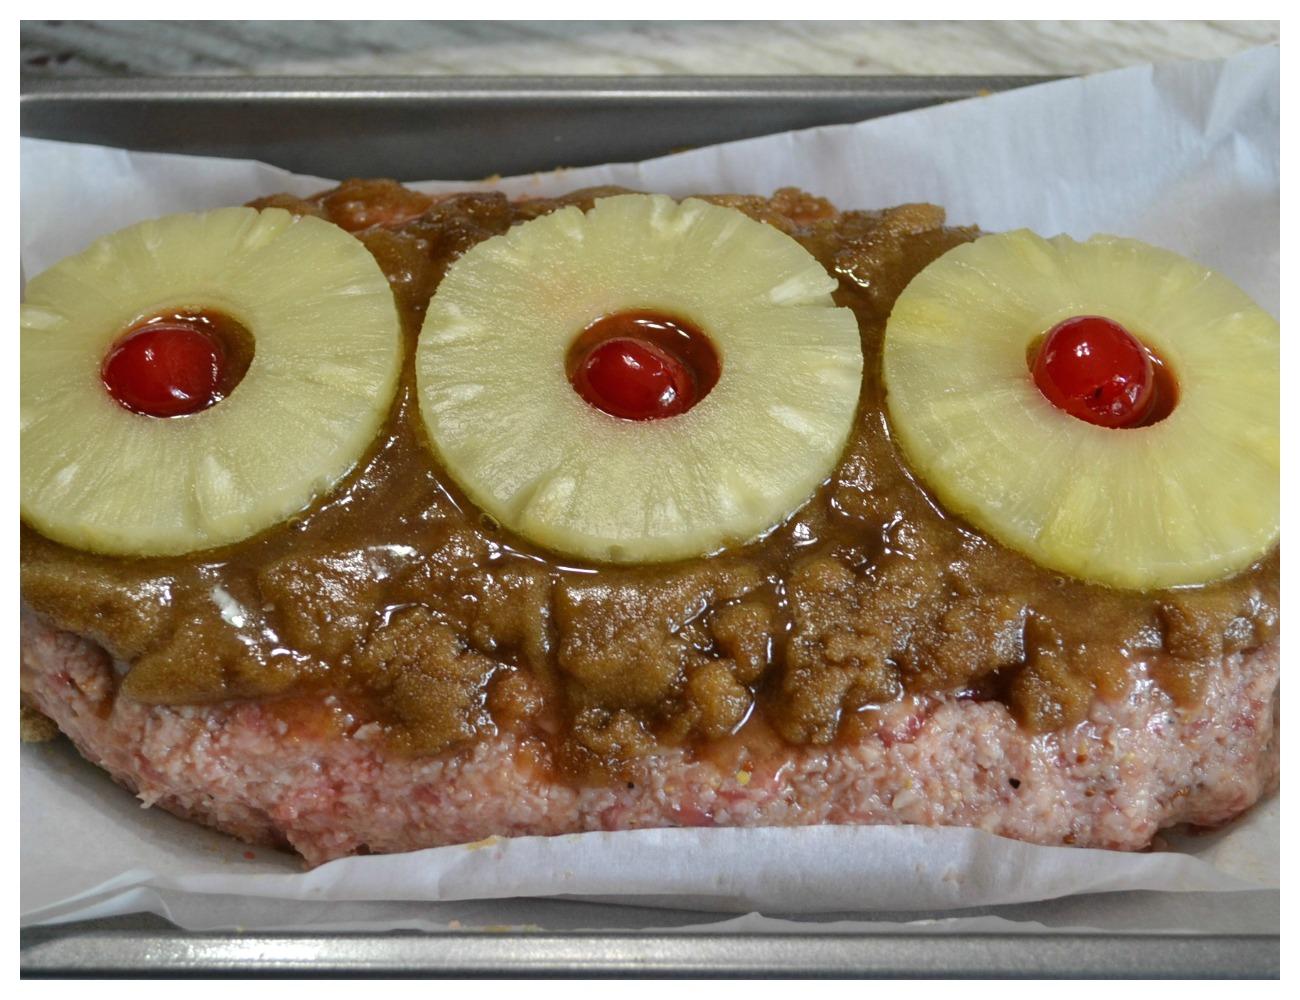 Ham Loaf With Brown Sugar Glaze Grandma Honey S House Watermelon Wallpaper Rainbow Find Free HD for Desktop [freshlhys.tk]